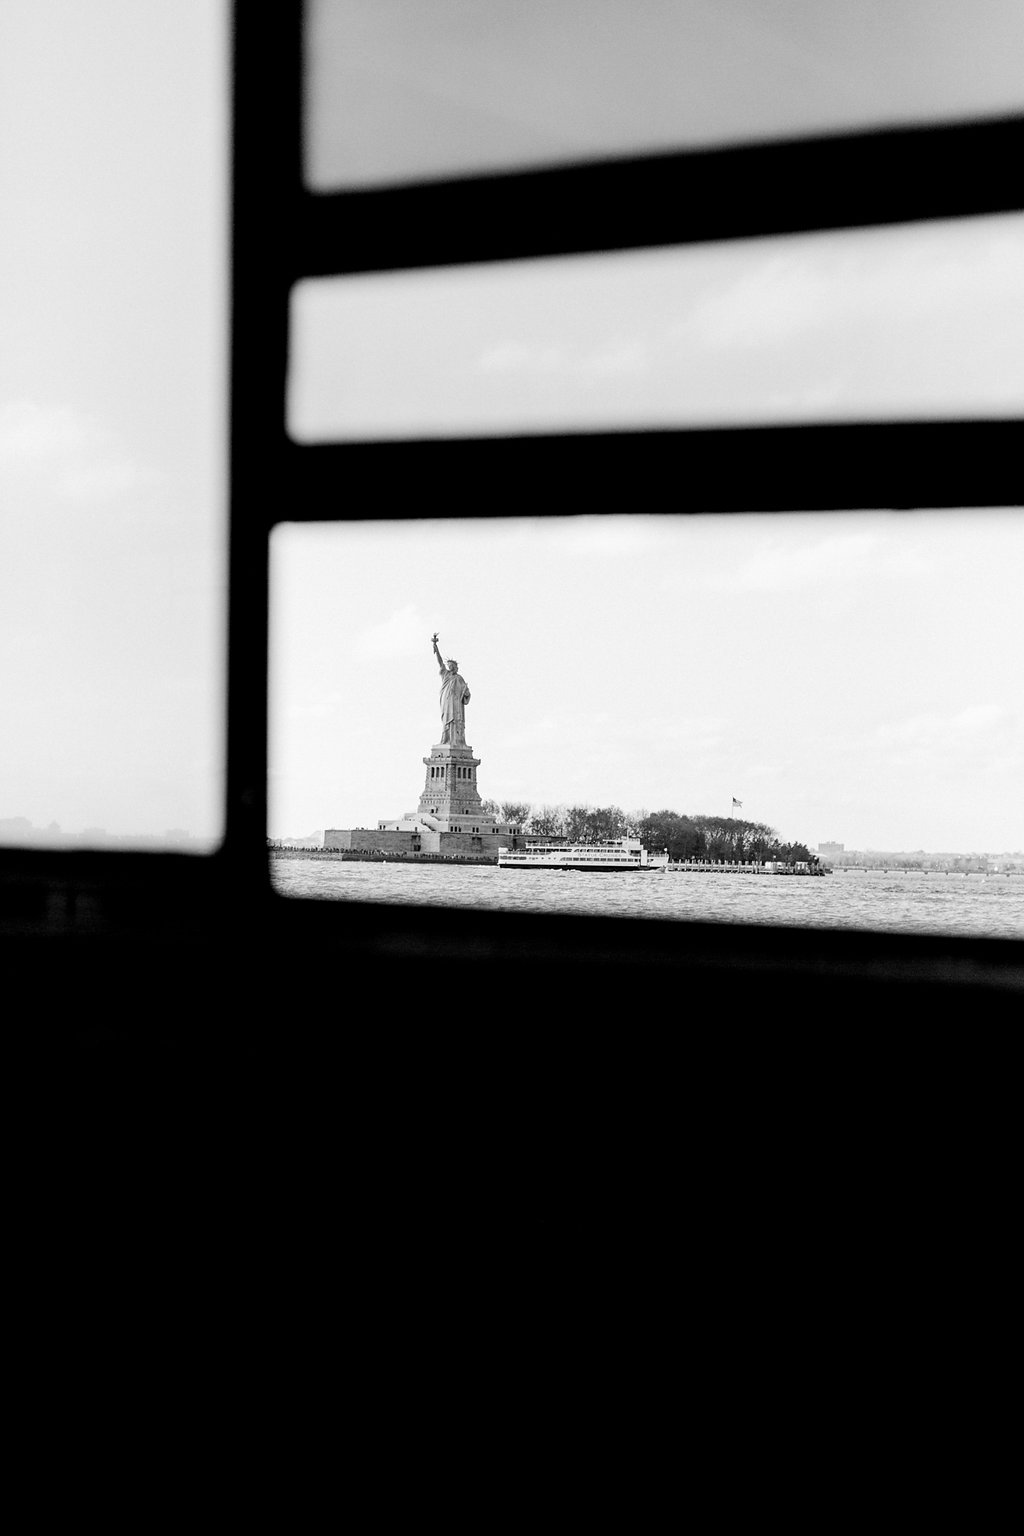 New-York-BW-405.jpg